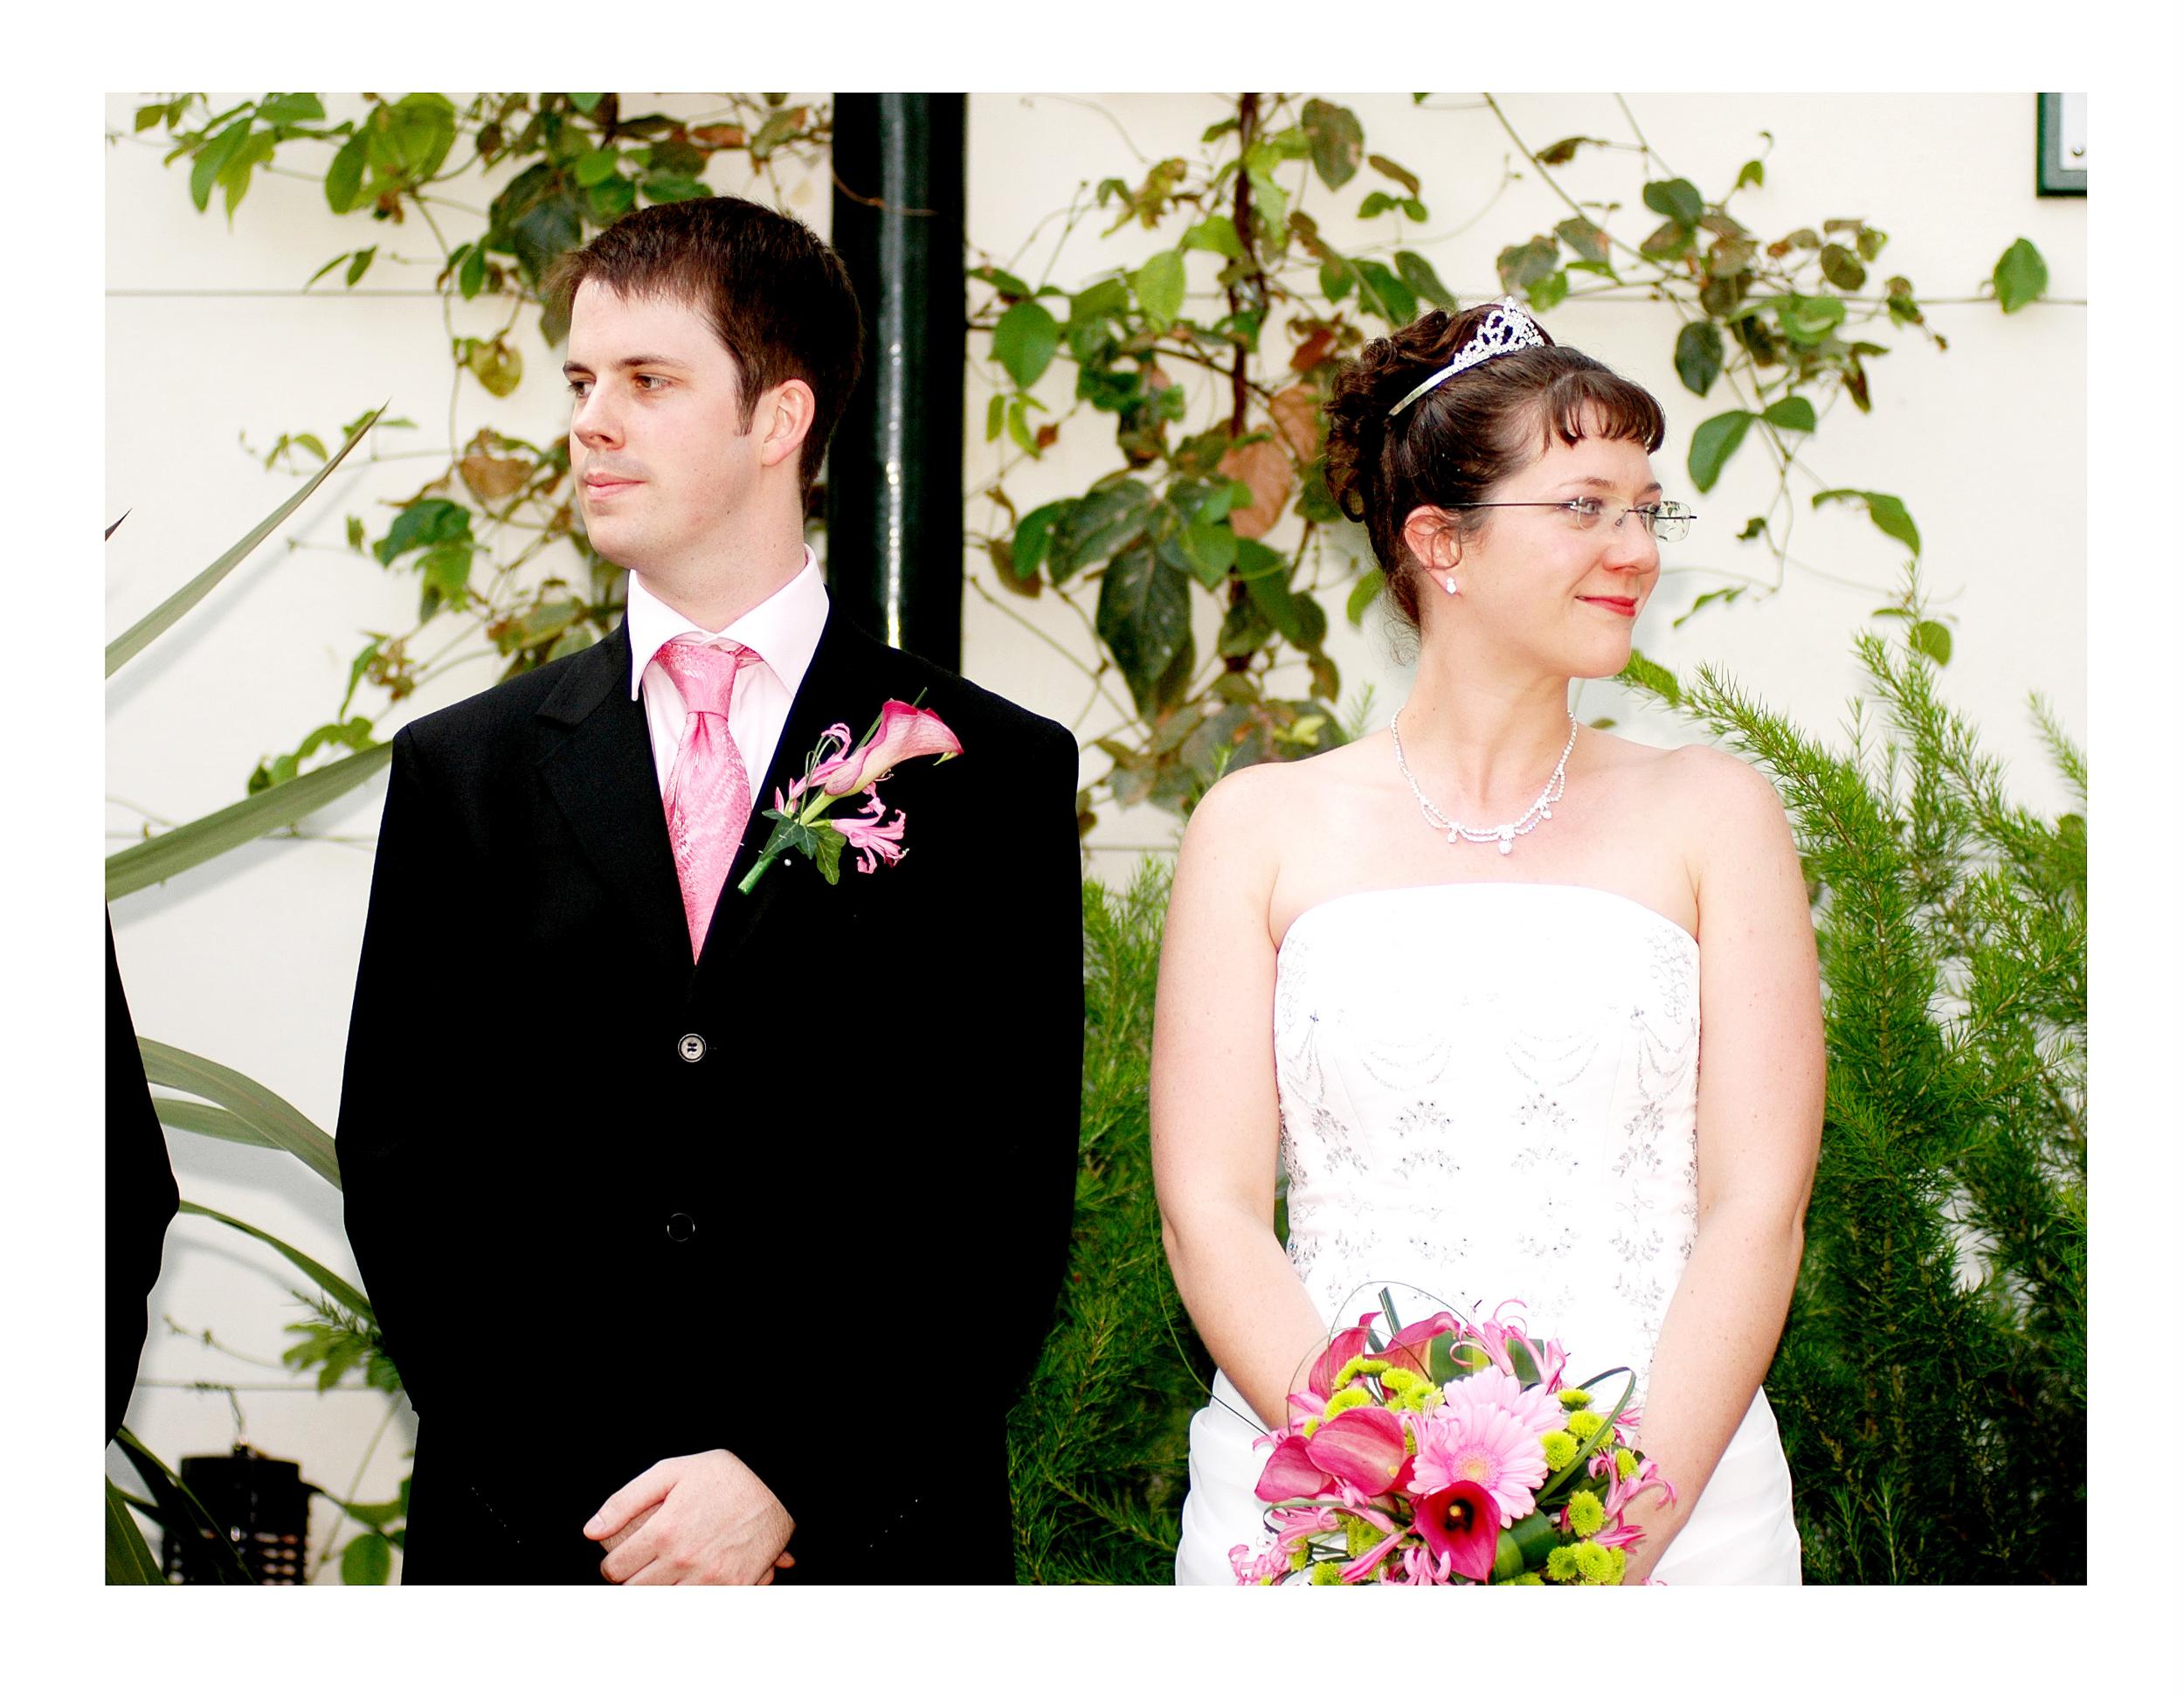 REPORTAGE-WEDDING-PHOTOGRAPHY-SET-UK-8.jpg